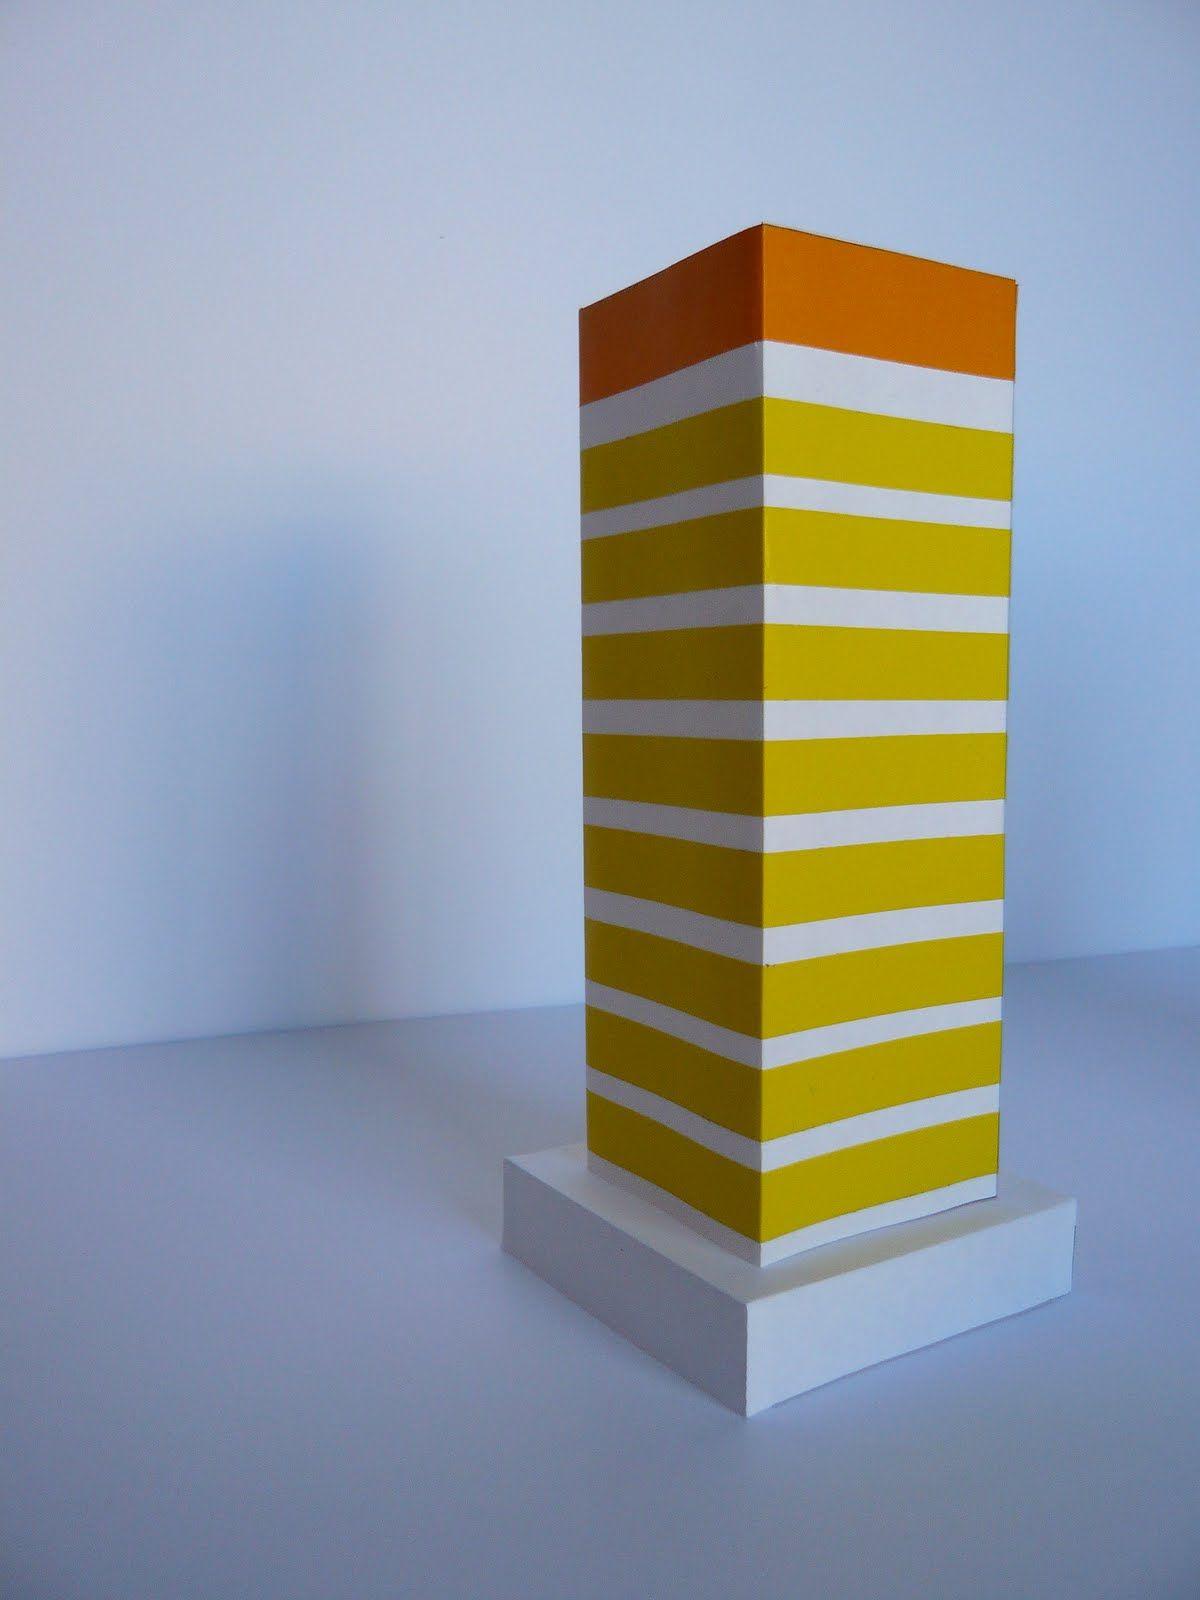 Superbox ettore sottsass mobili moderni mobili moderno for Arredamento postmoderno